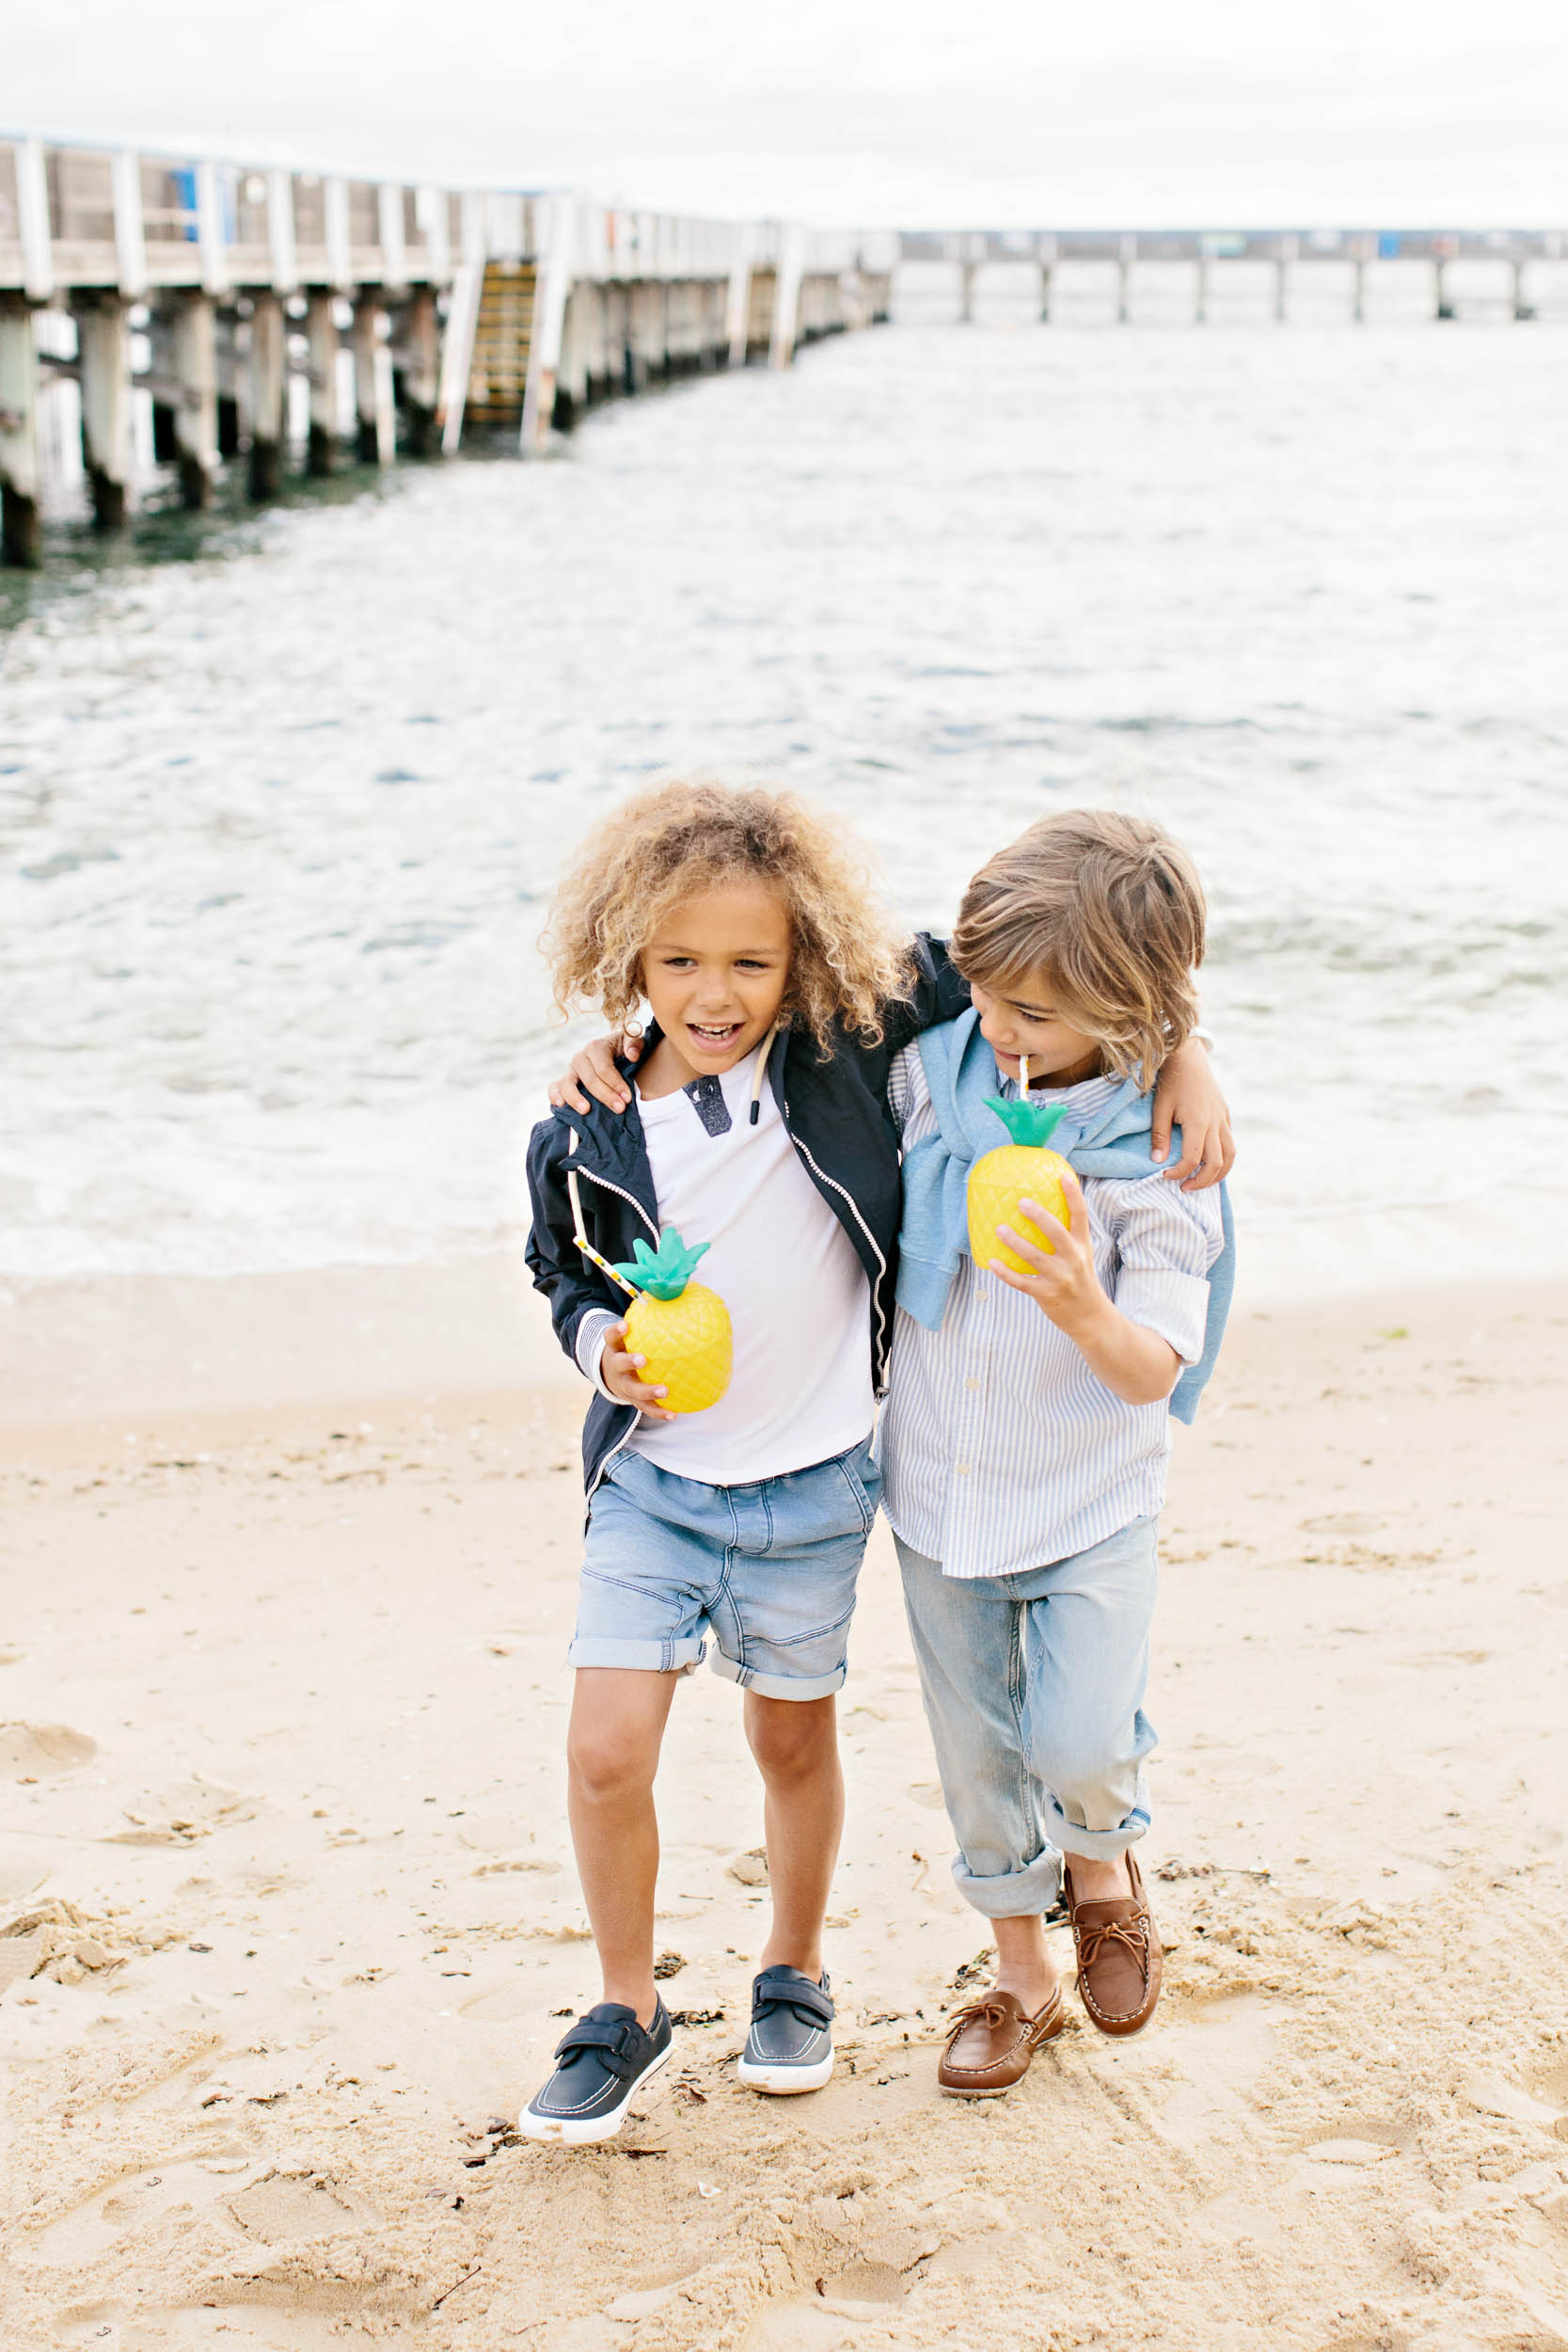 Kas-Richards-LENZO_Betts-Kids-Shoes-234.jpg